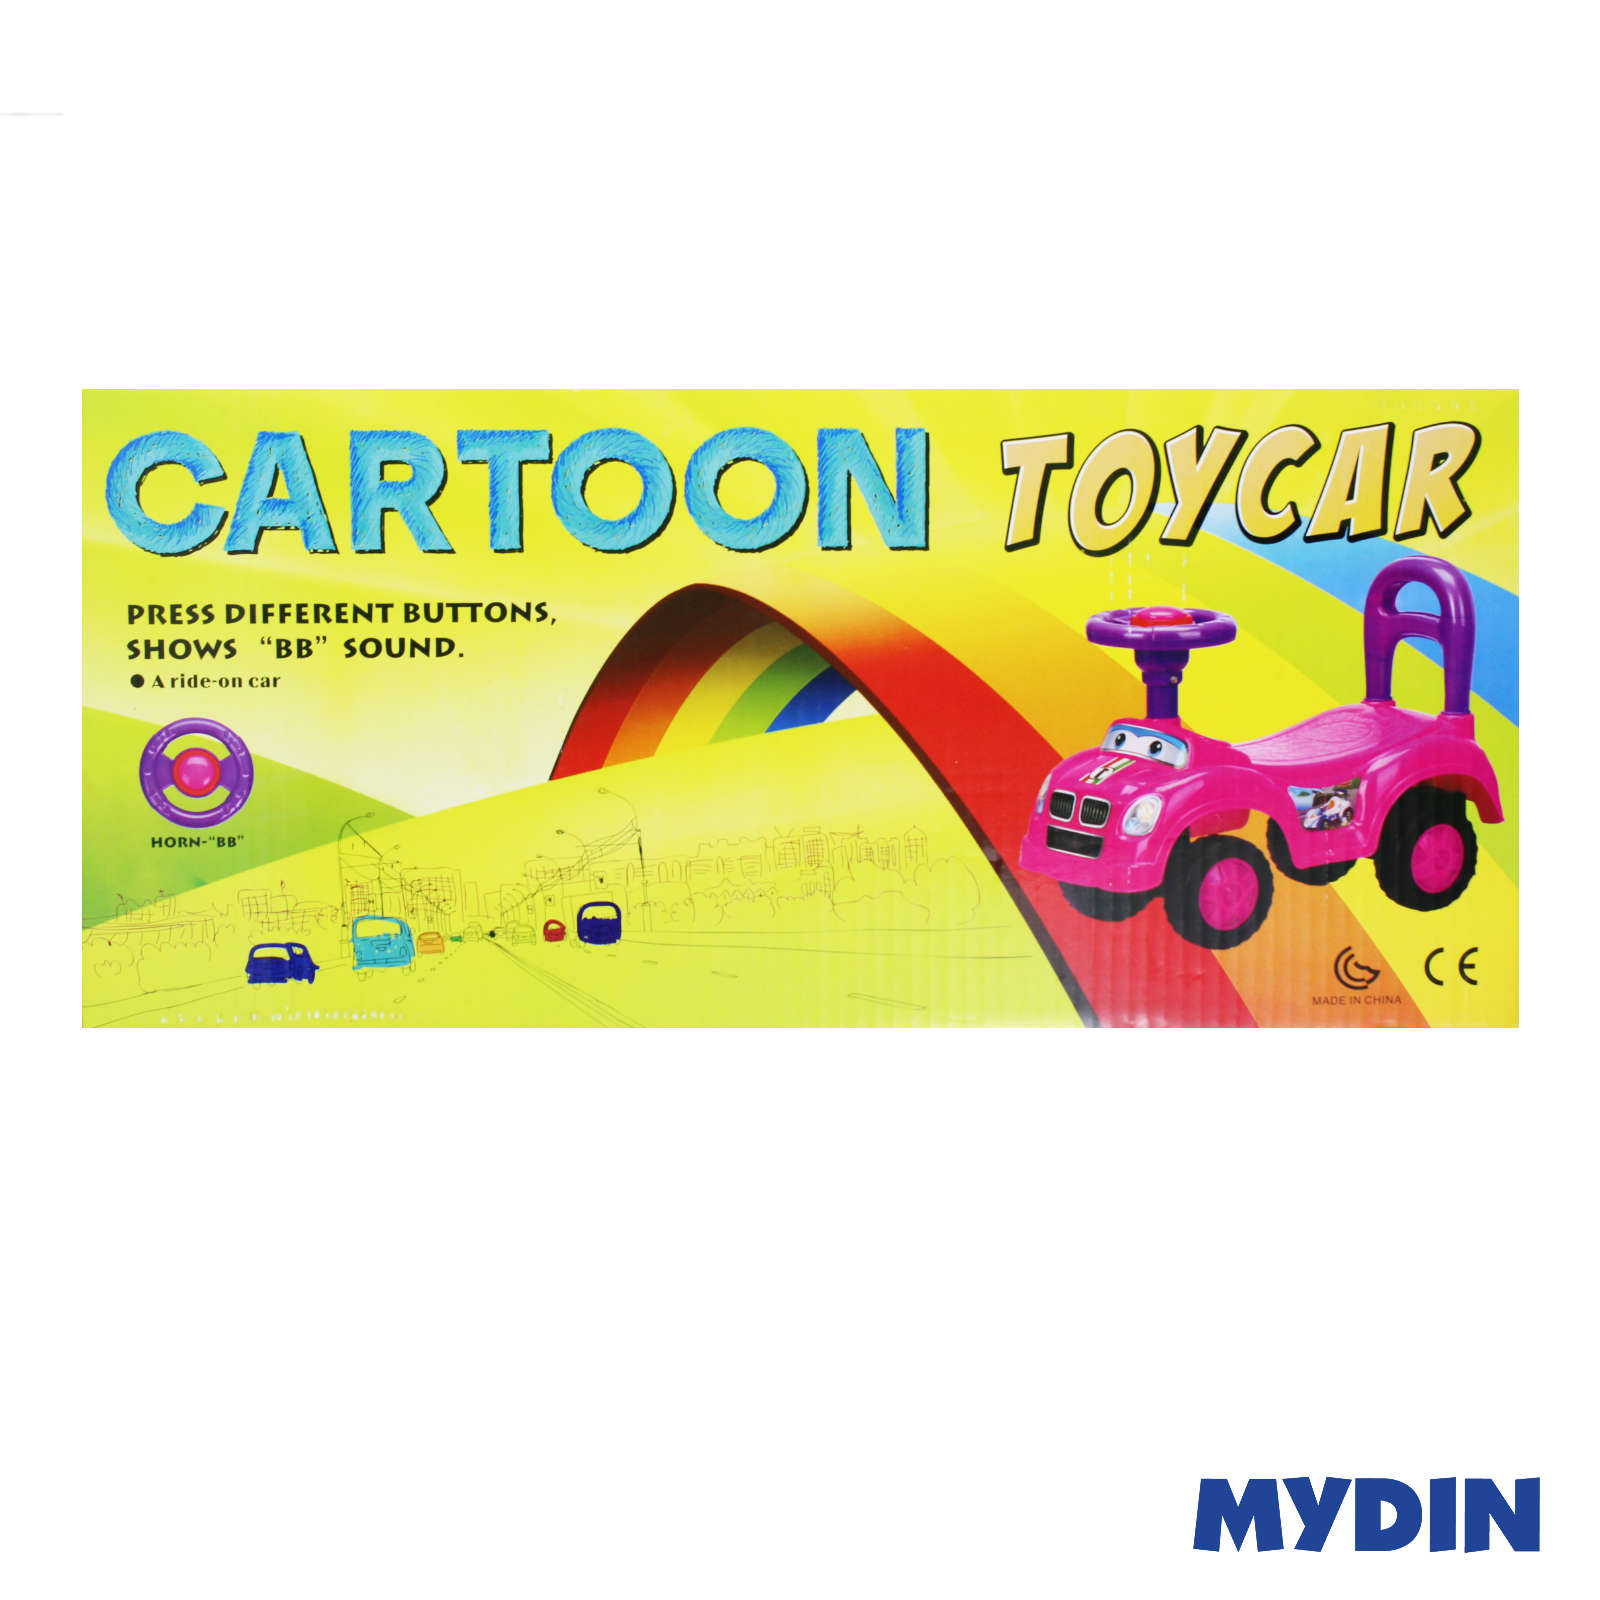 Cartoon Toy Push Car SP709-1